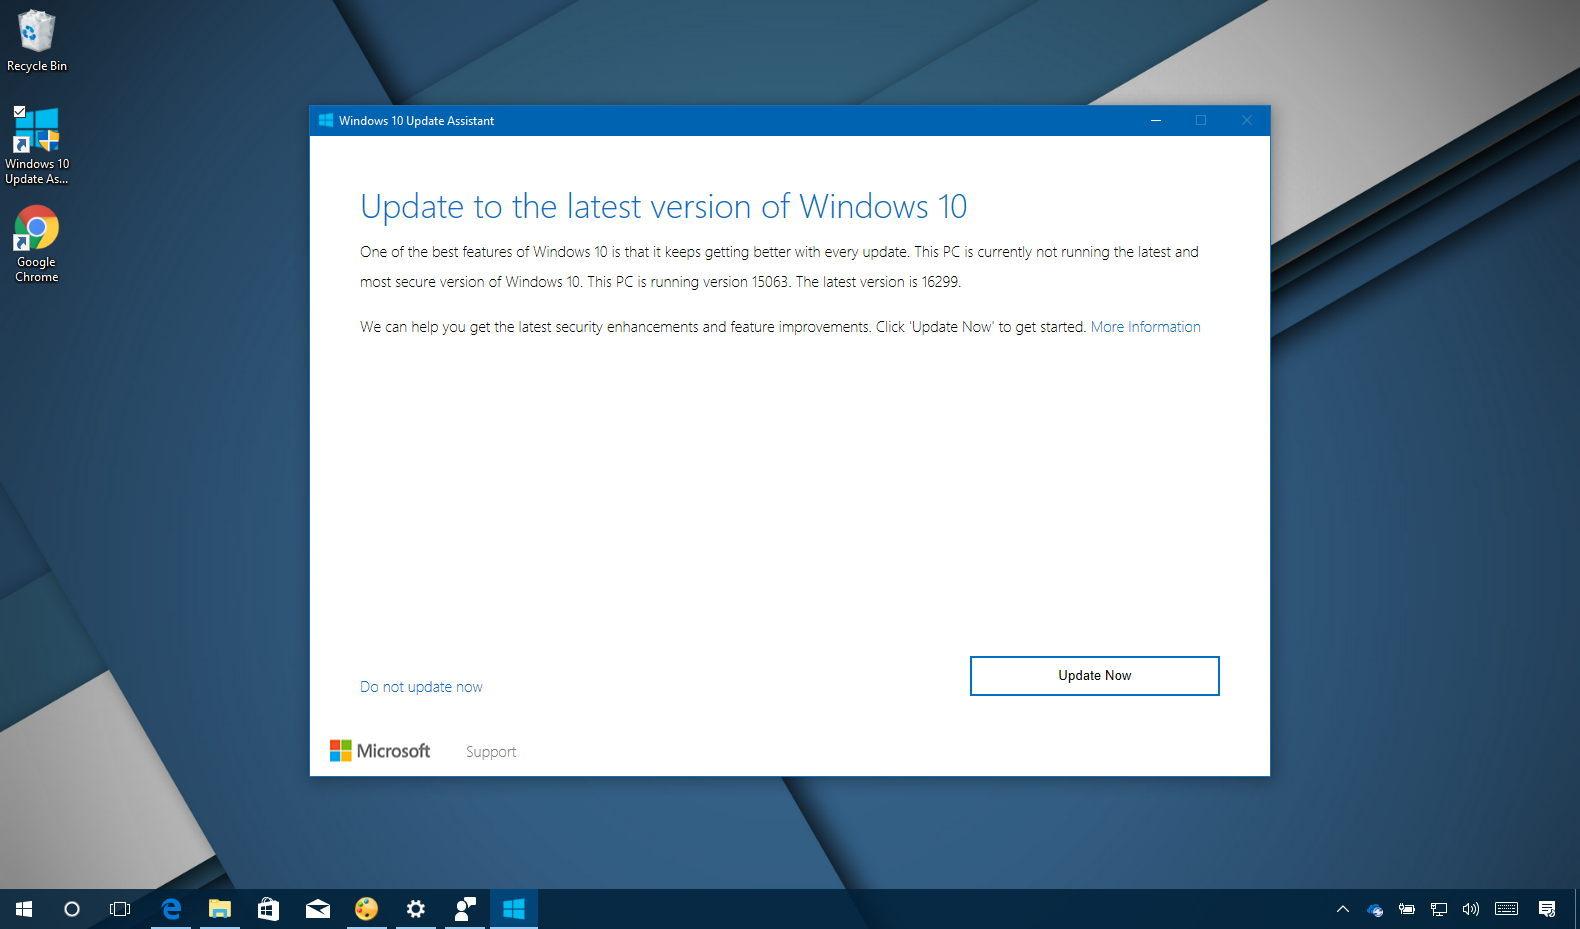 windows 10 upgrade 1709 download